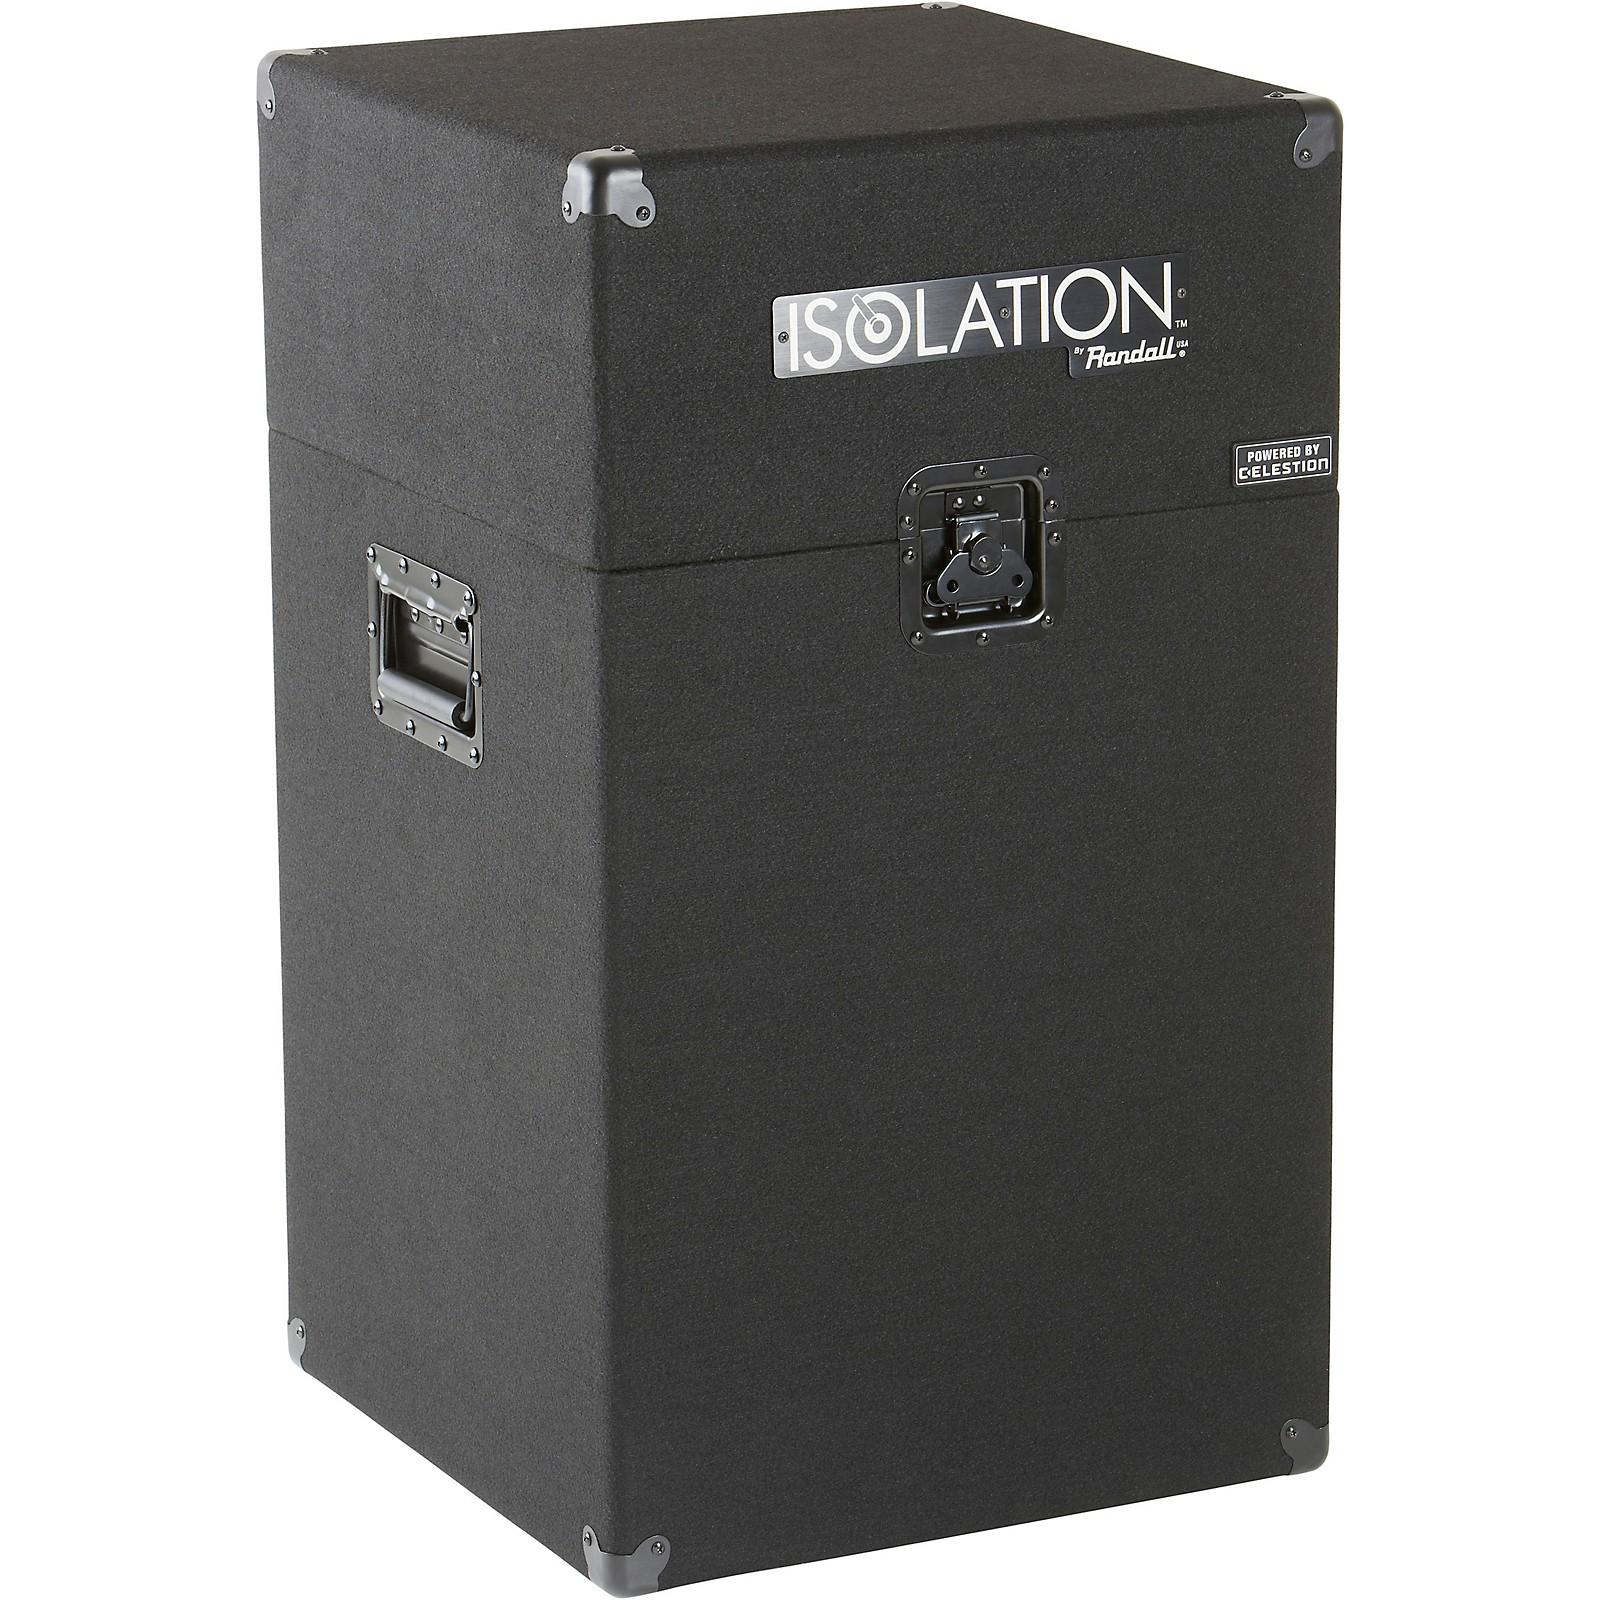 Randall Isolation 12 Speaker Cab